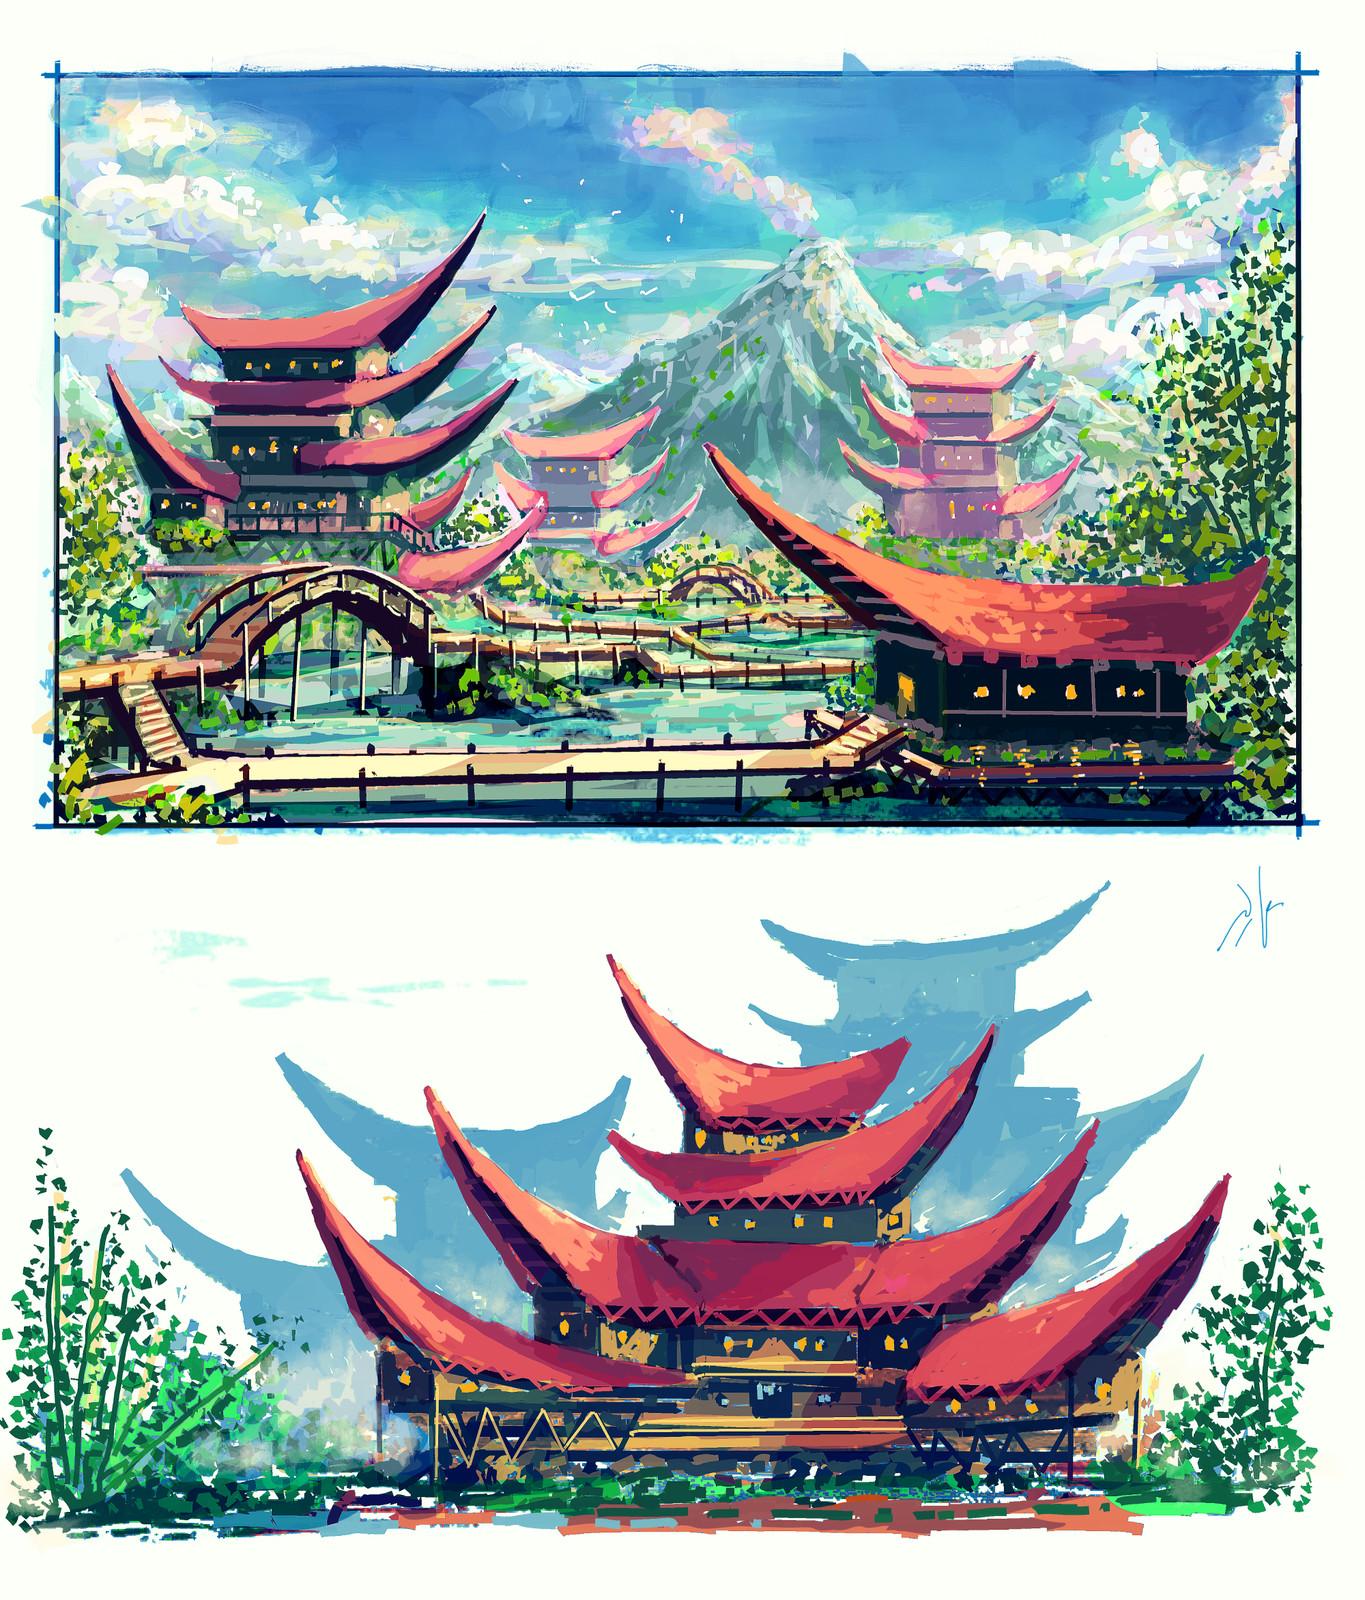 SouthEast Asian design